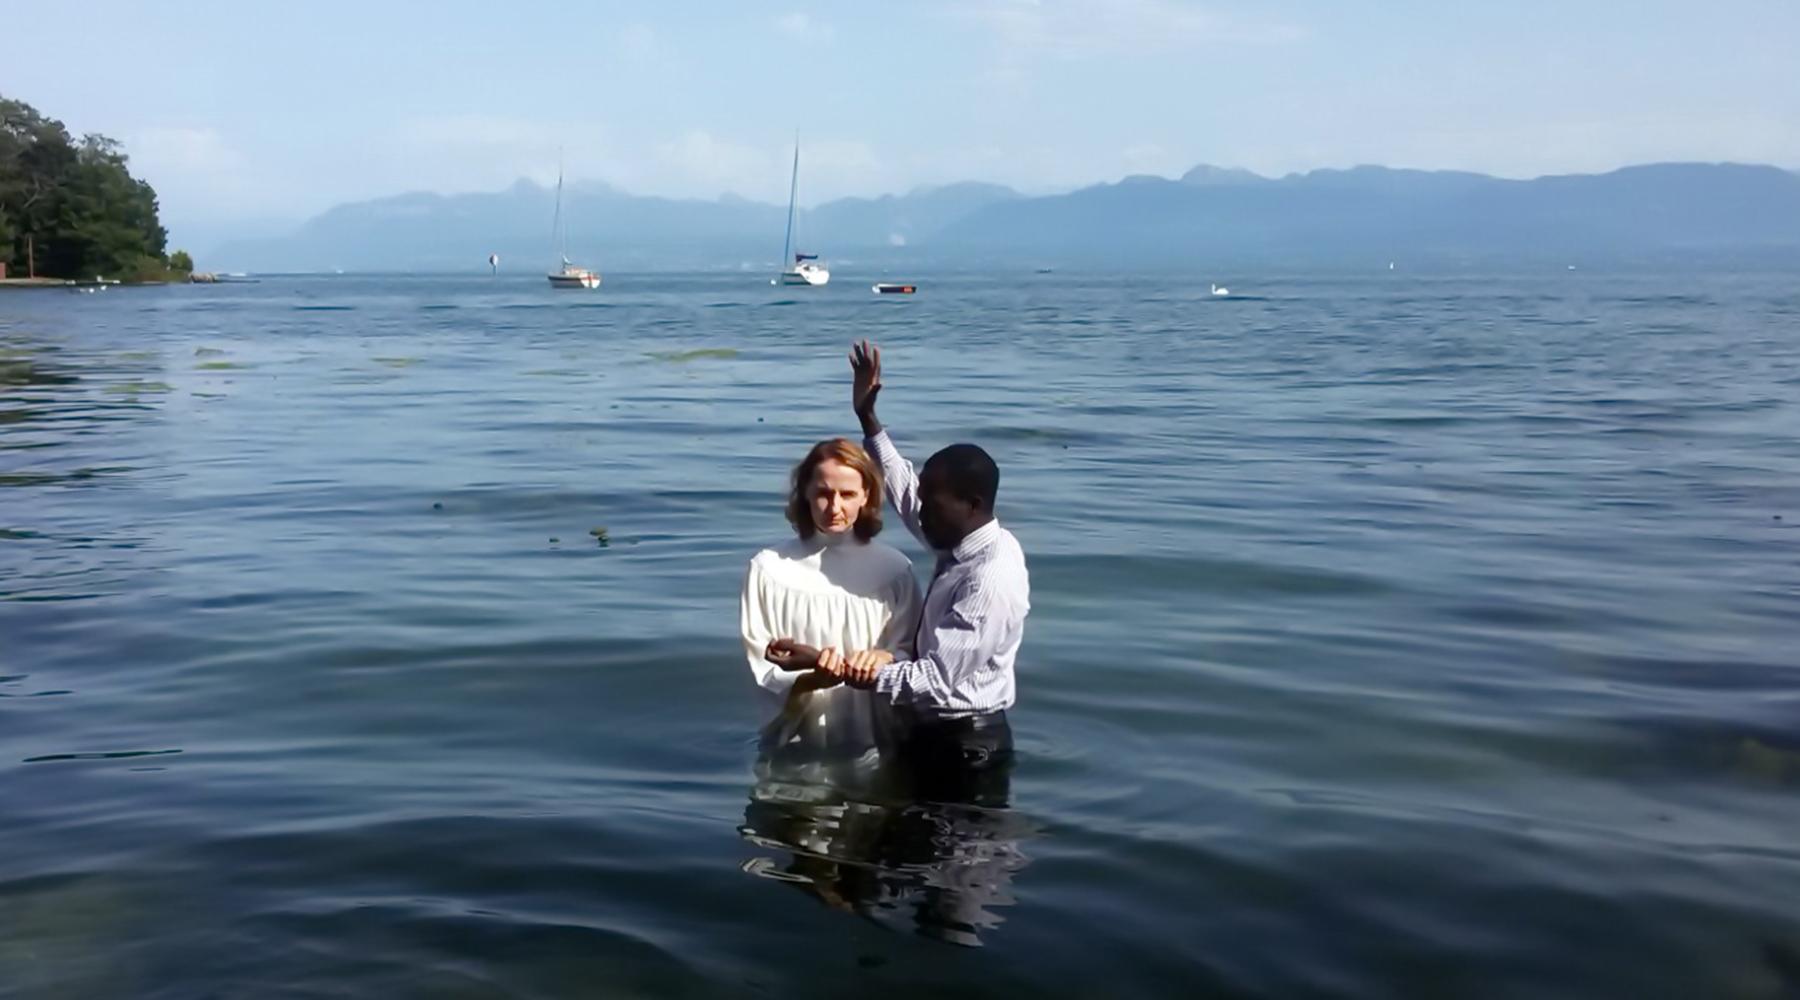 « SEIGNEUR, JE REVIENS… POUR NE PLUS JAMAIS ERRER » – BAPTÊME ANGLOPHONE À GLAND